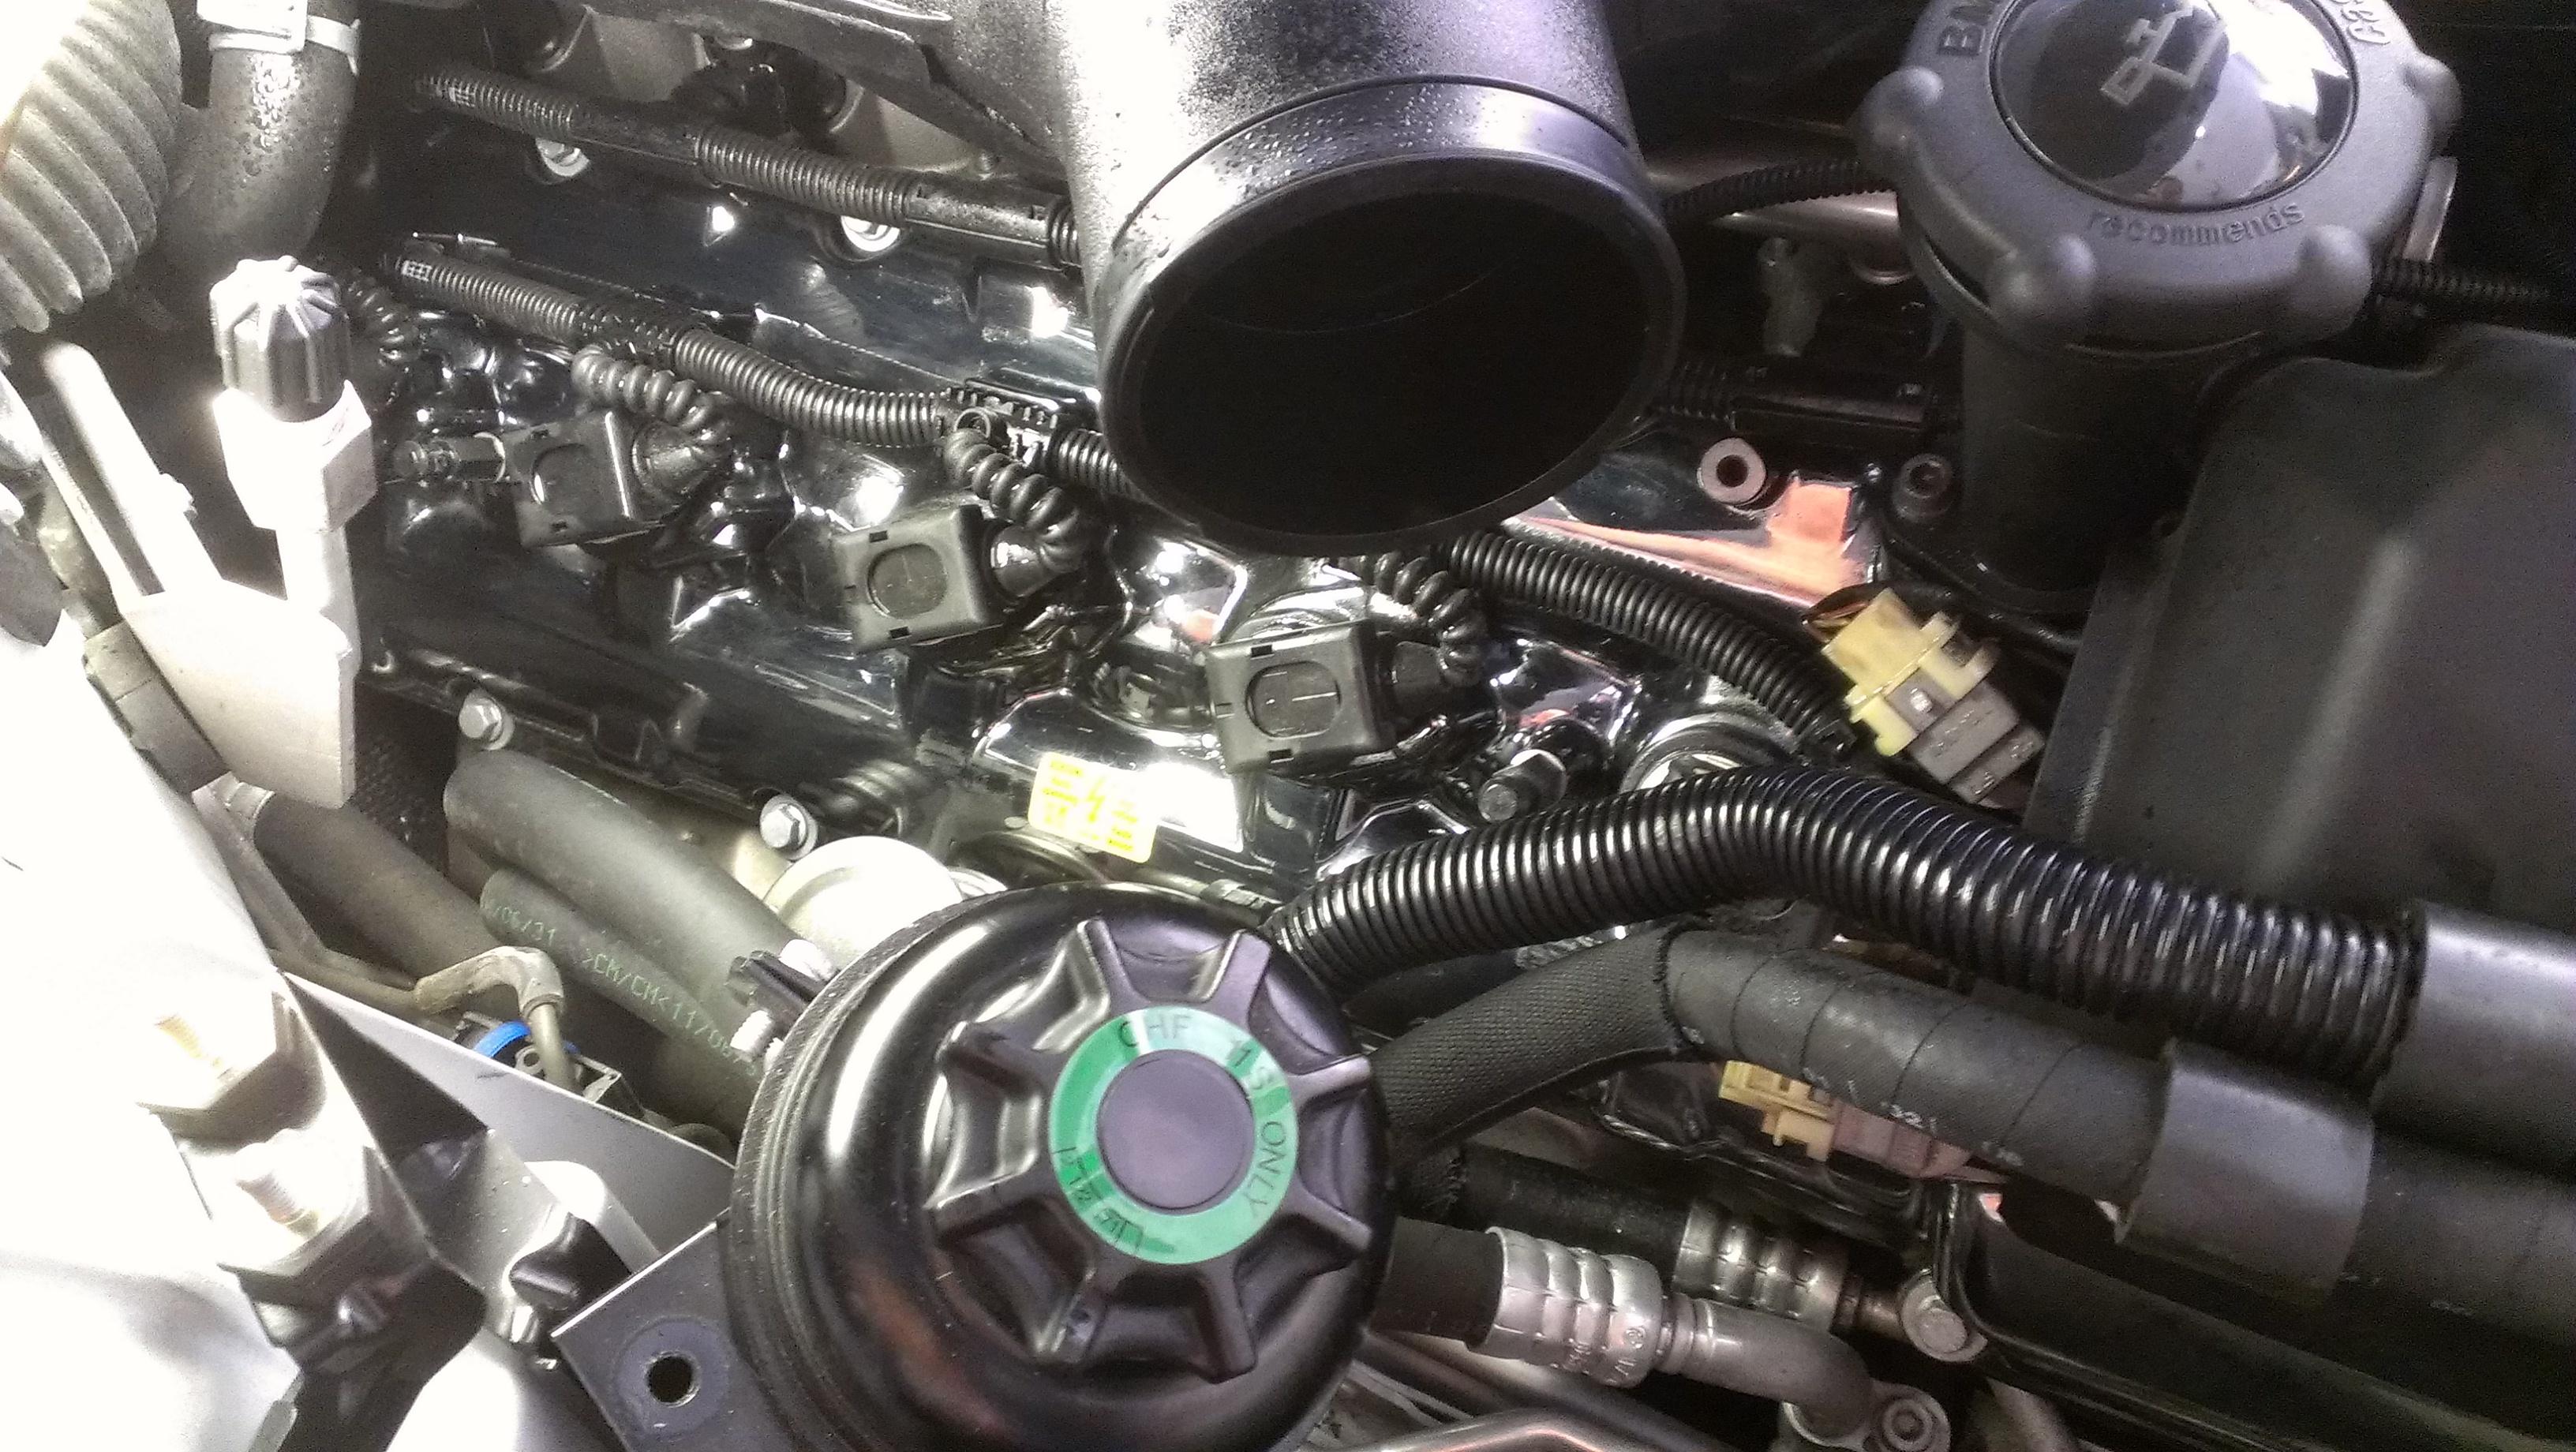 e60 M5 Spark Plug  Air Filter DIY w Pics Good Resource for DIY